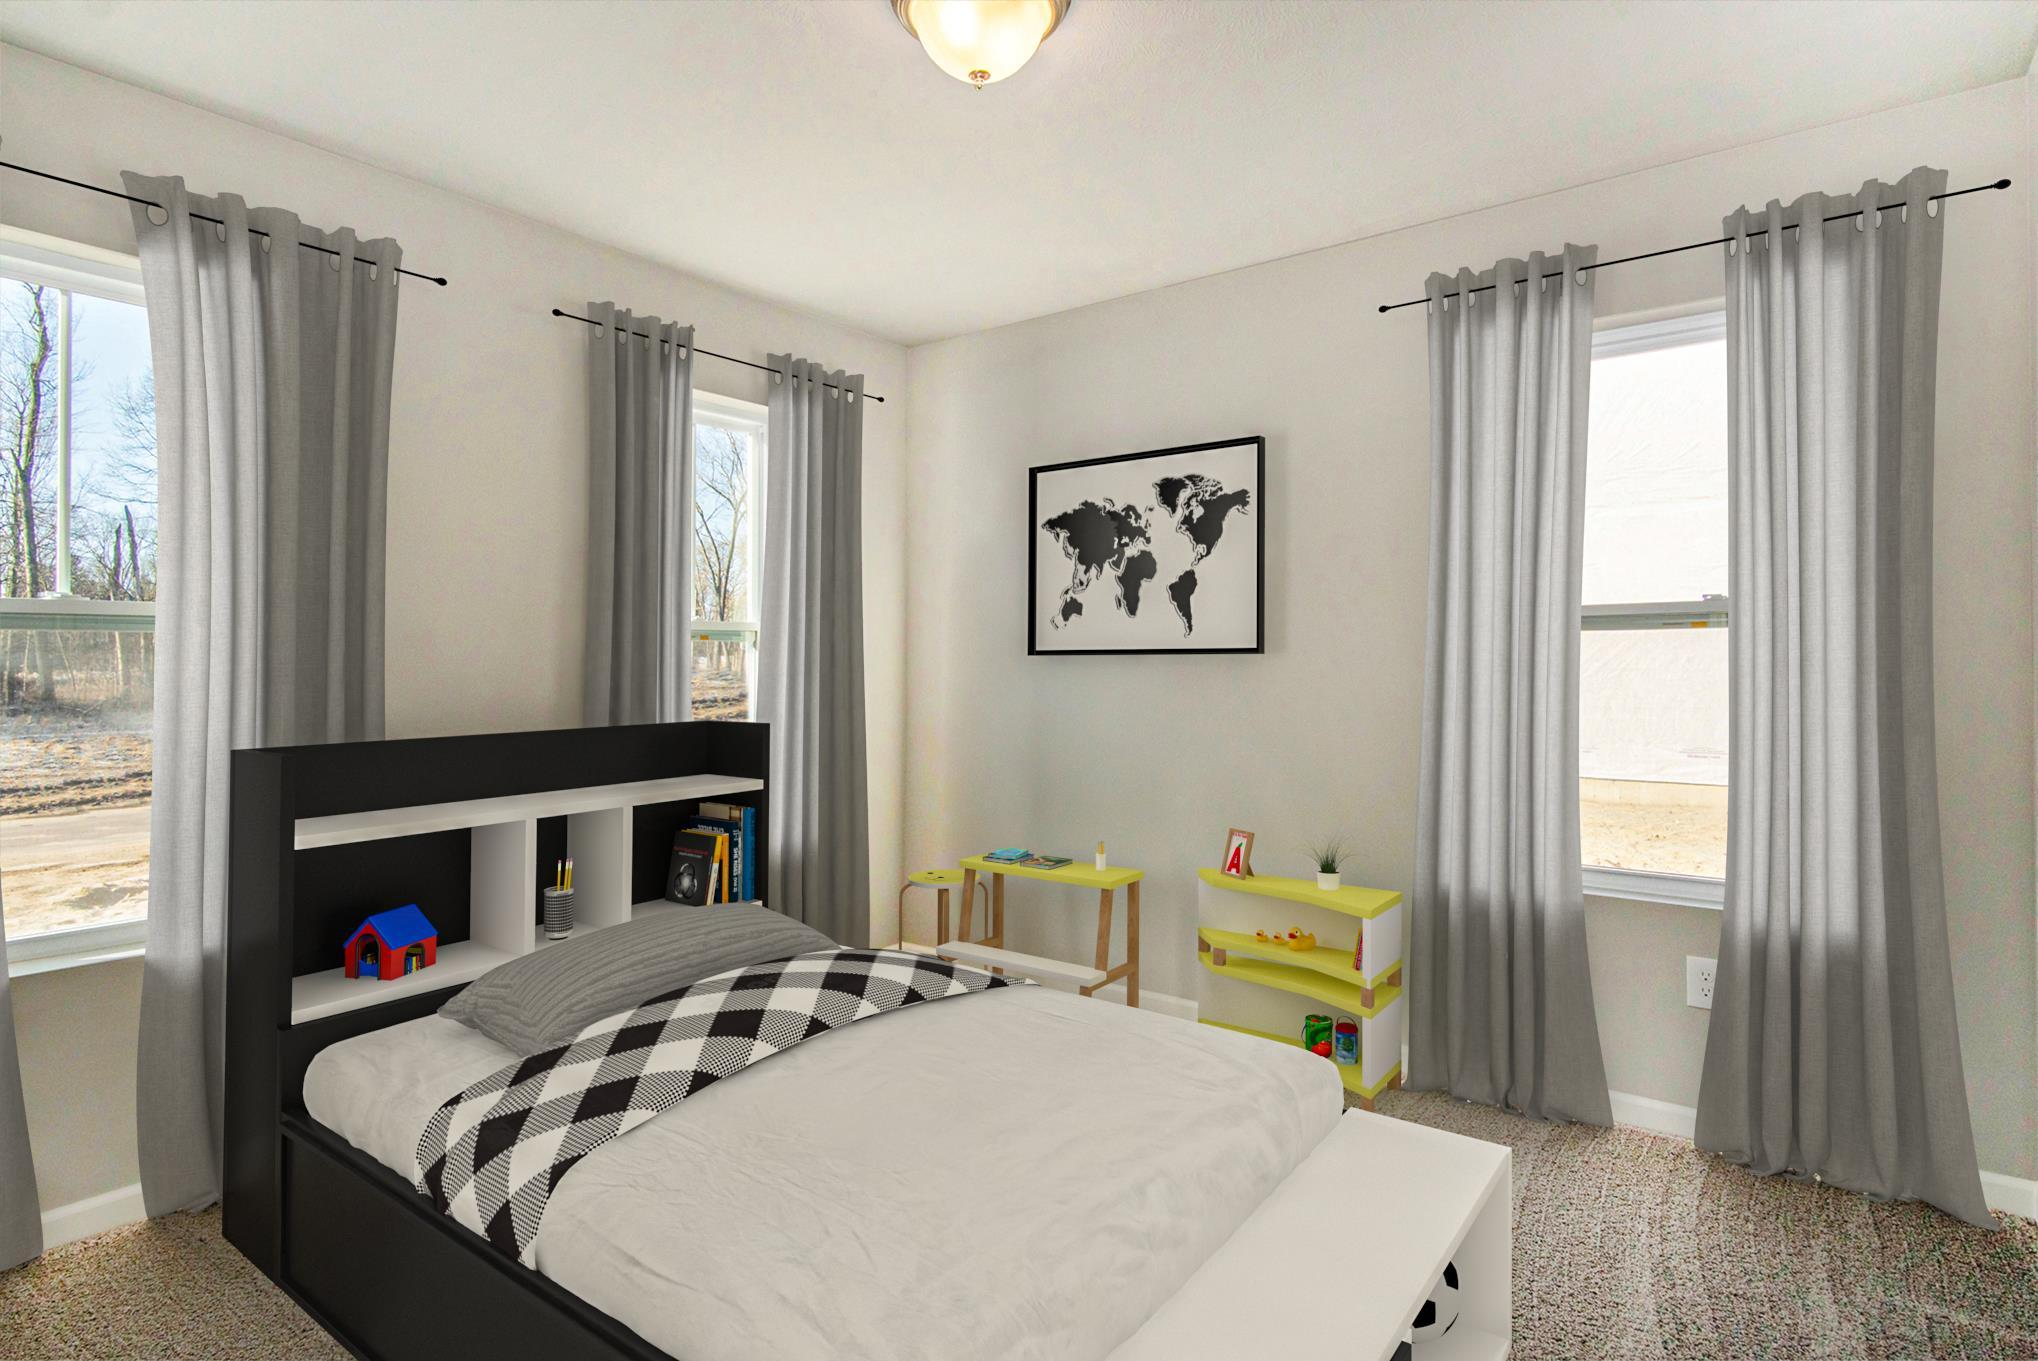 Bedroom featured in the Elements 1600 By Allen Edwin Homes in Grand Rapids, MI